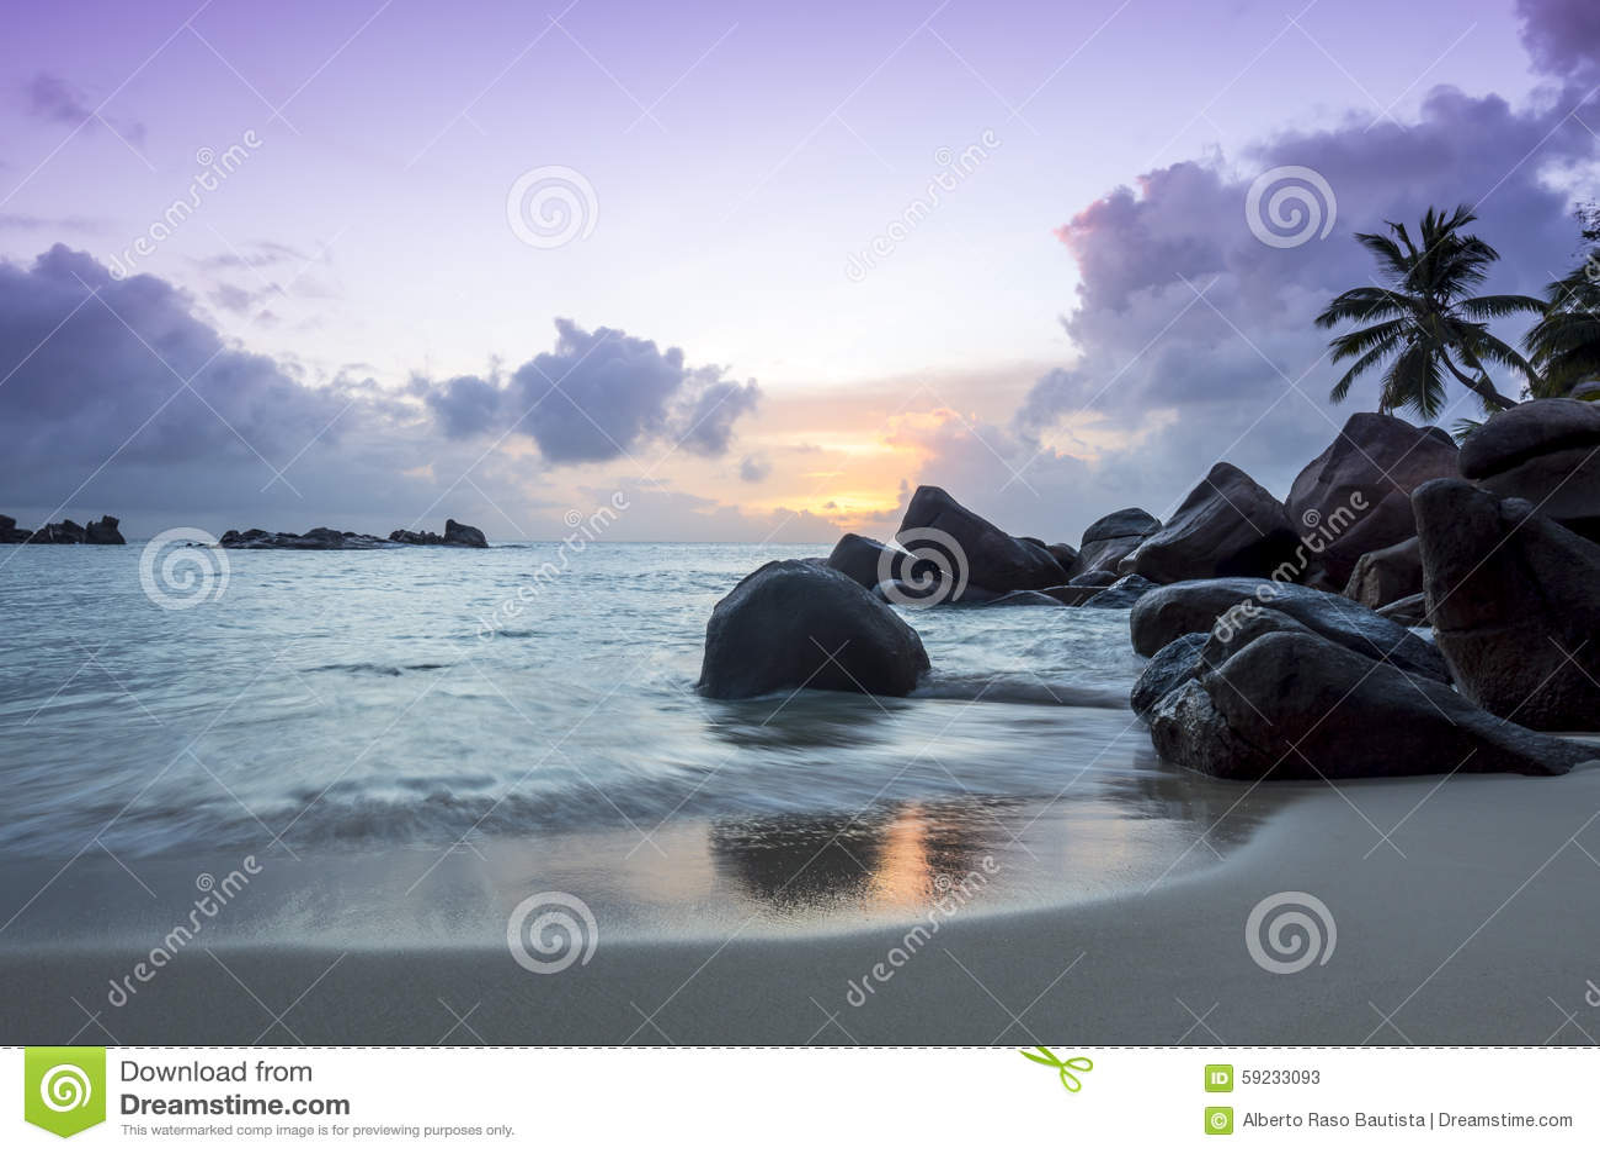 Puesta del sol en la playa tropical - Seychelles - fondo de la naturaleza